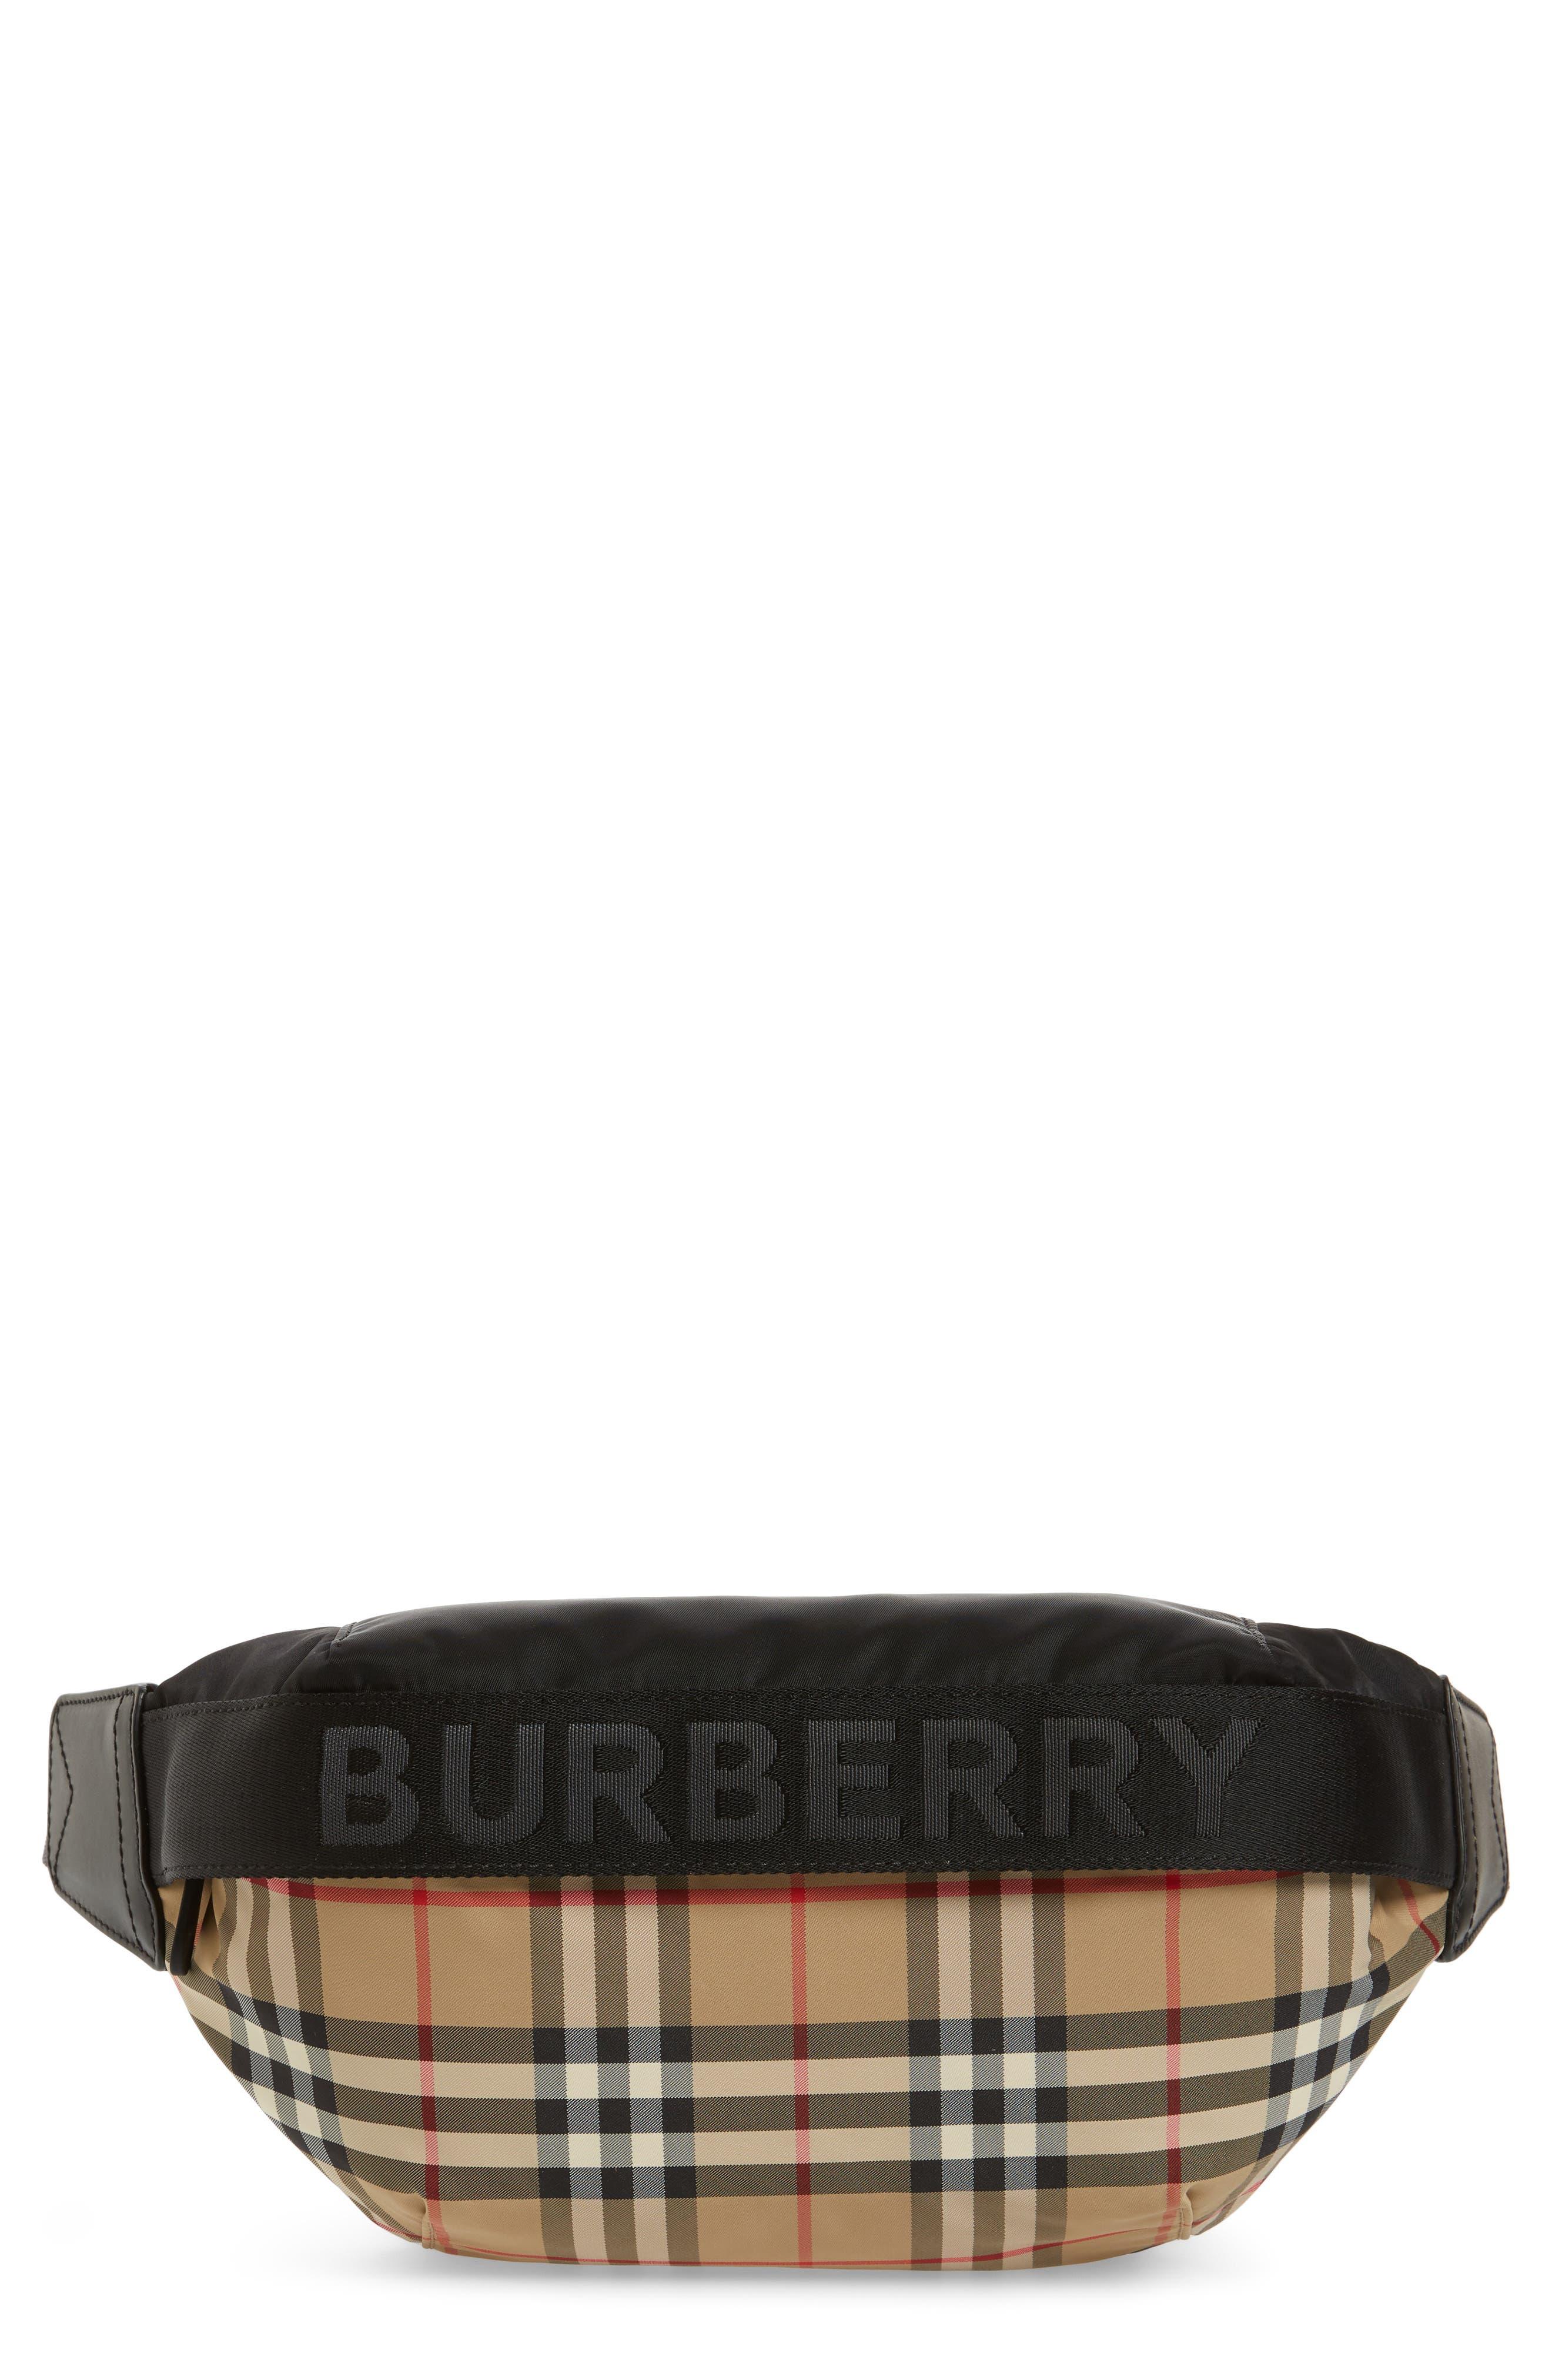 3494ac1ce210 Burberry Burberrry Medium Sonny Vintage Check Belt Bag - Beige In Neutral